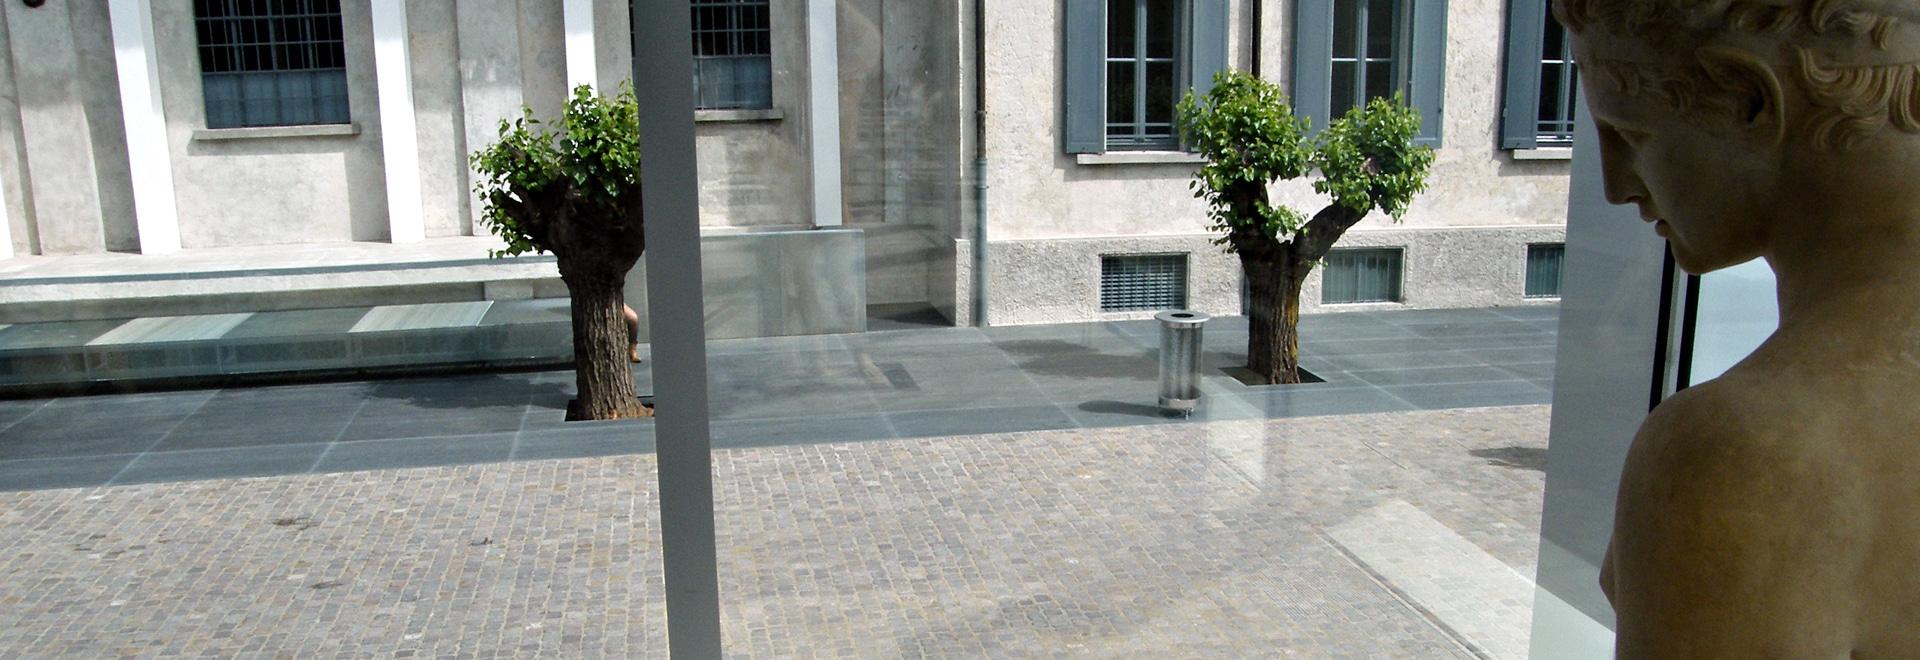 AT PRADA FOUNDATION IN MILAN, ALL WALK ON PORPHYRY FROM TRENTINO